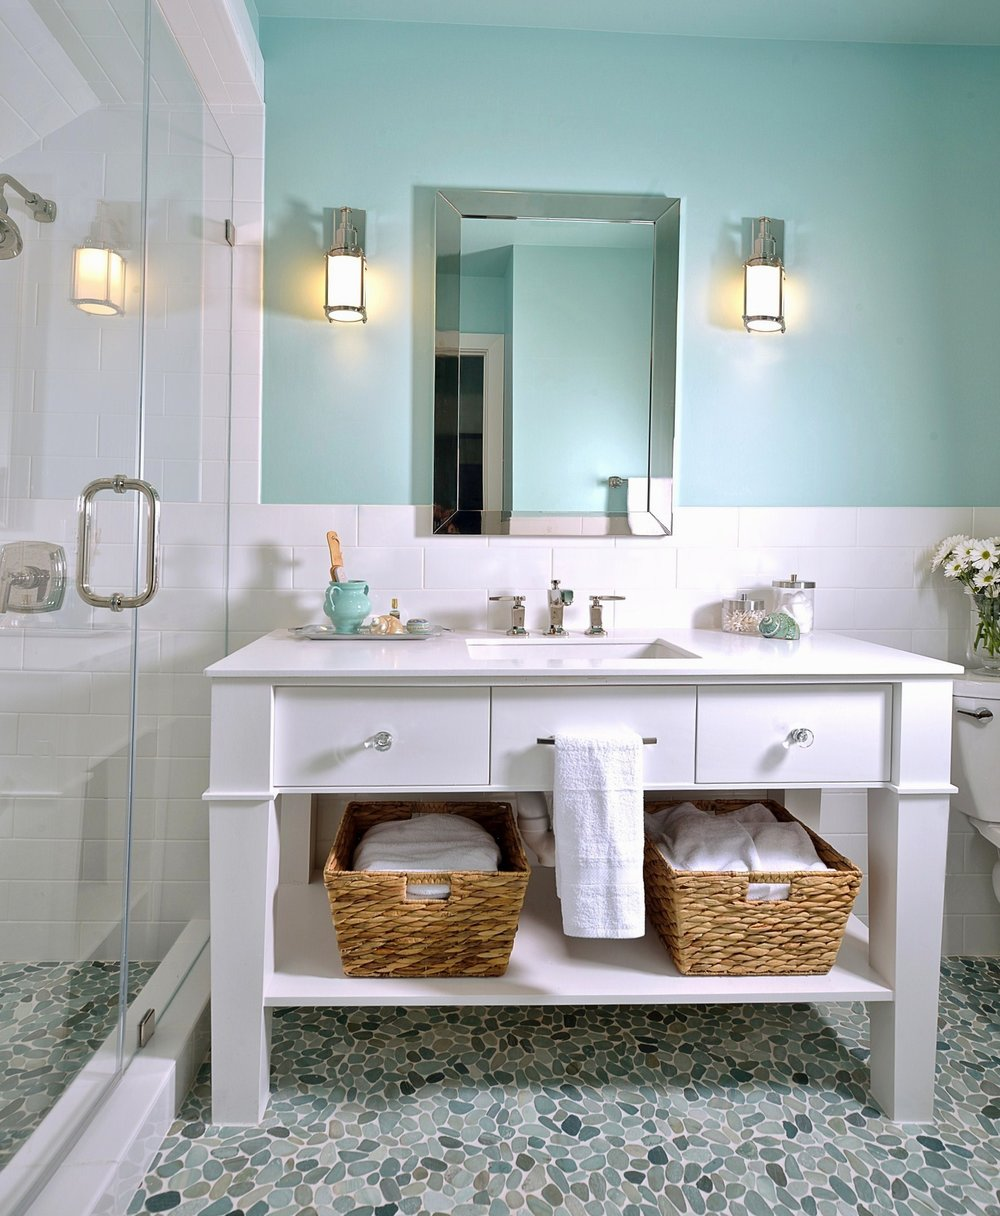 Girlu0027s Bathroom With Subway Tile Walls | Carla Aston, Designer